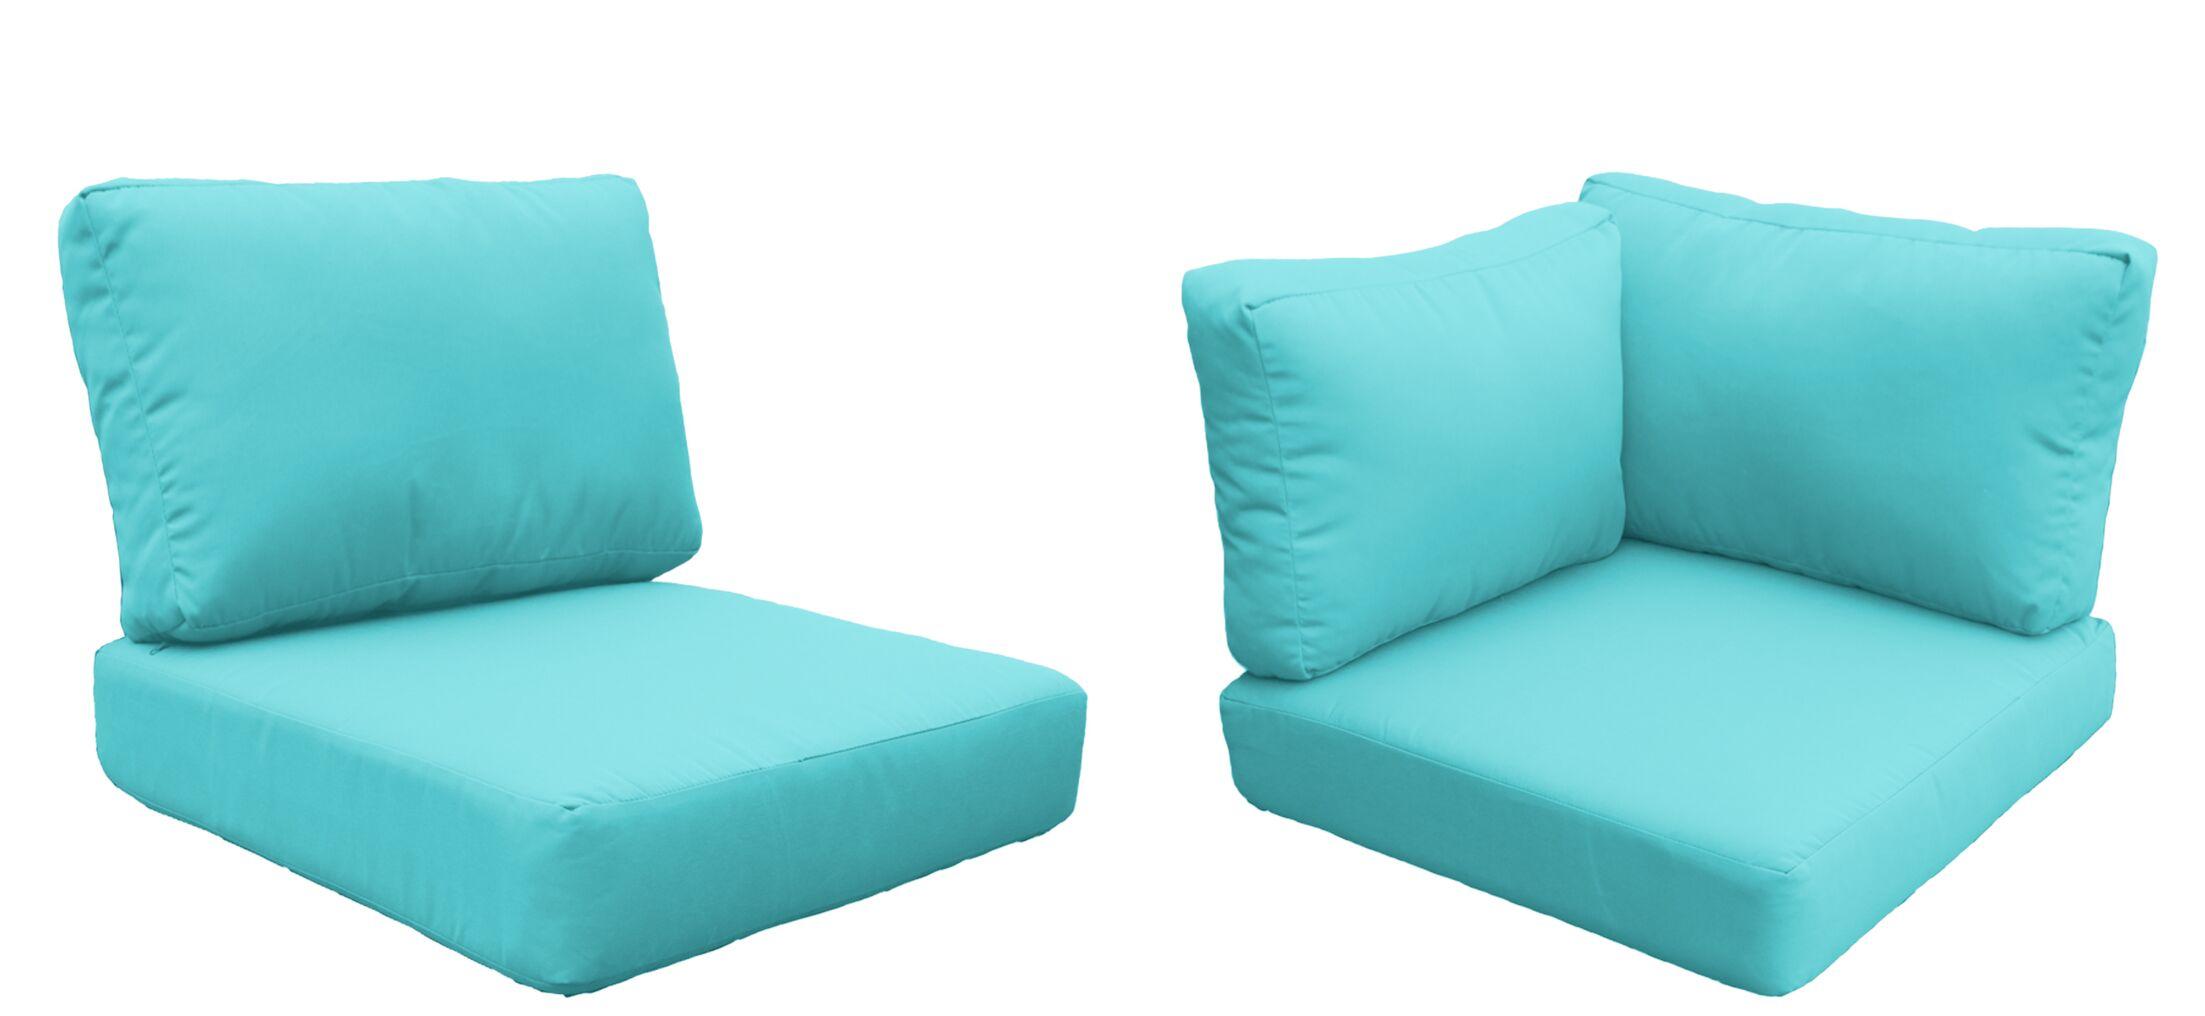 Eldredge Outdoor 15 Piece Lounge Chair Cushion Set Fabric: Aruba